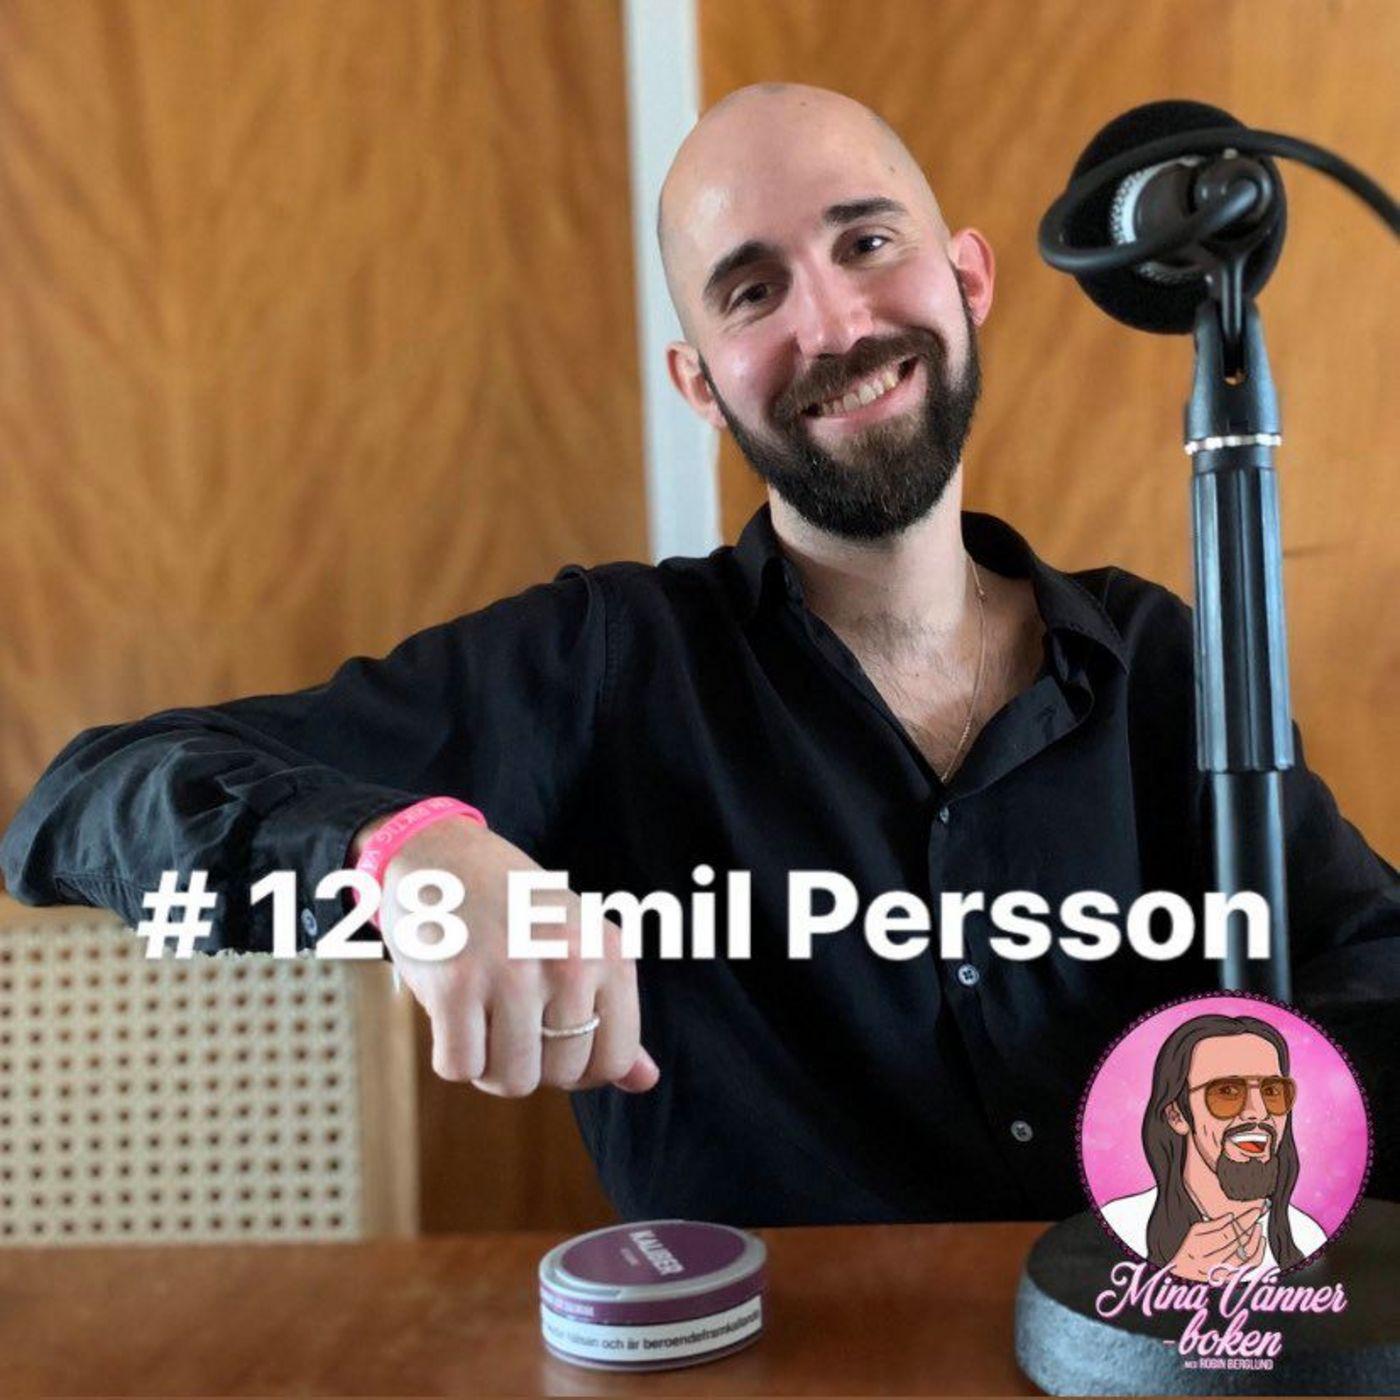 MVB #128 Emil Persson